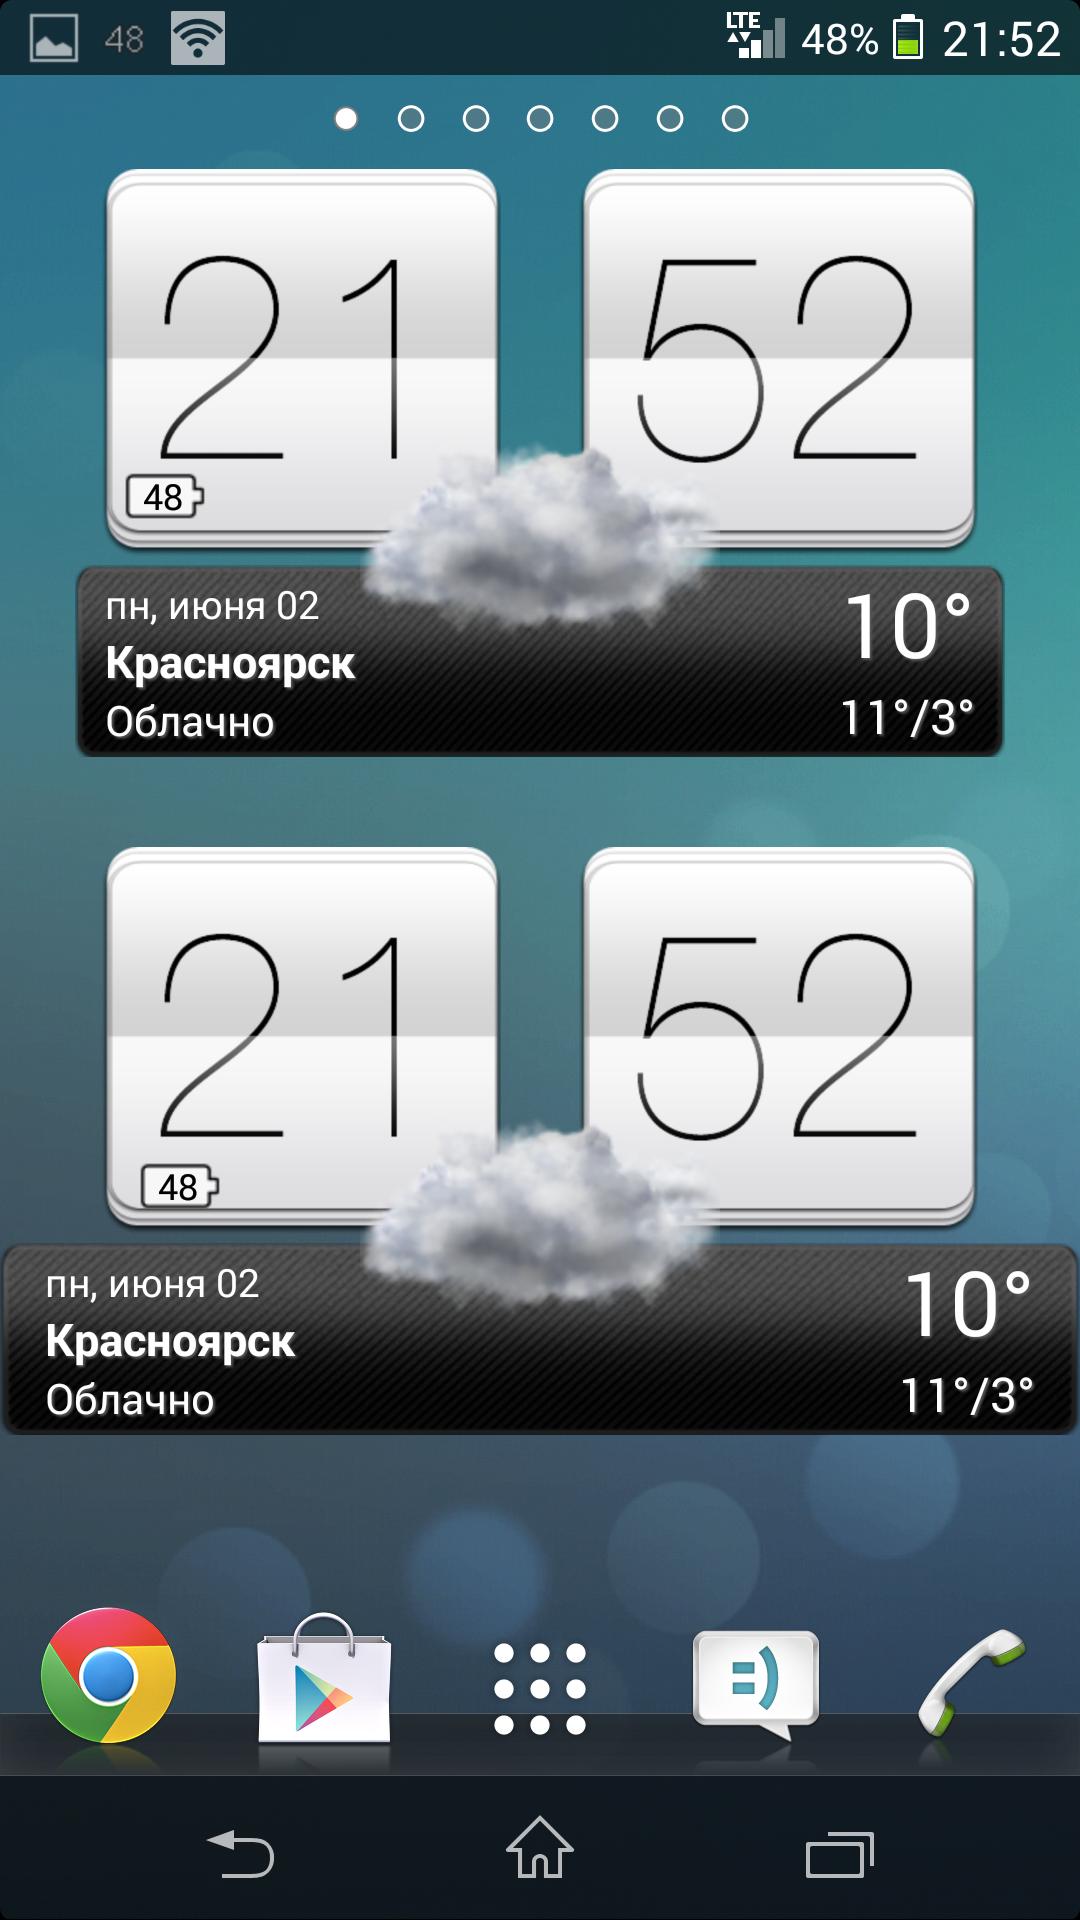 Картинки на телефон с часами и погодой